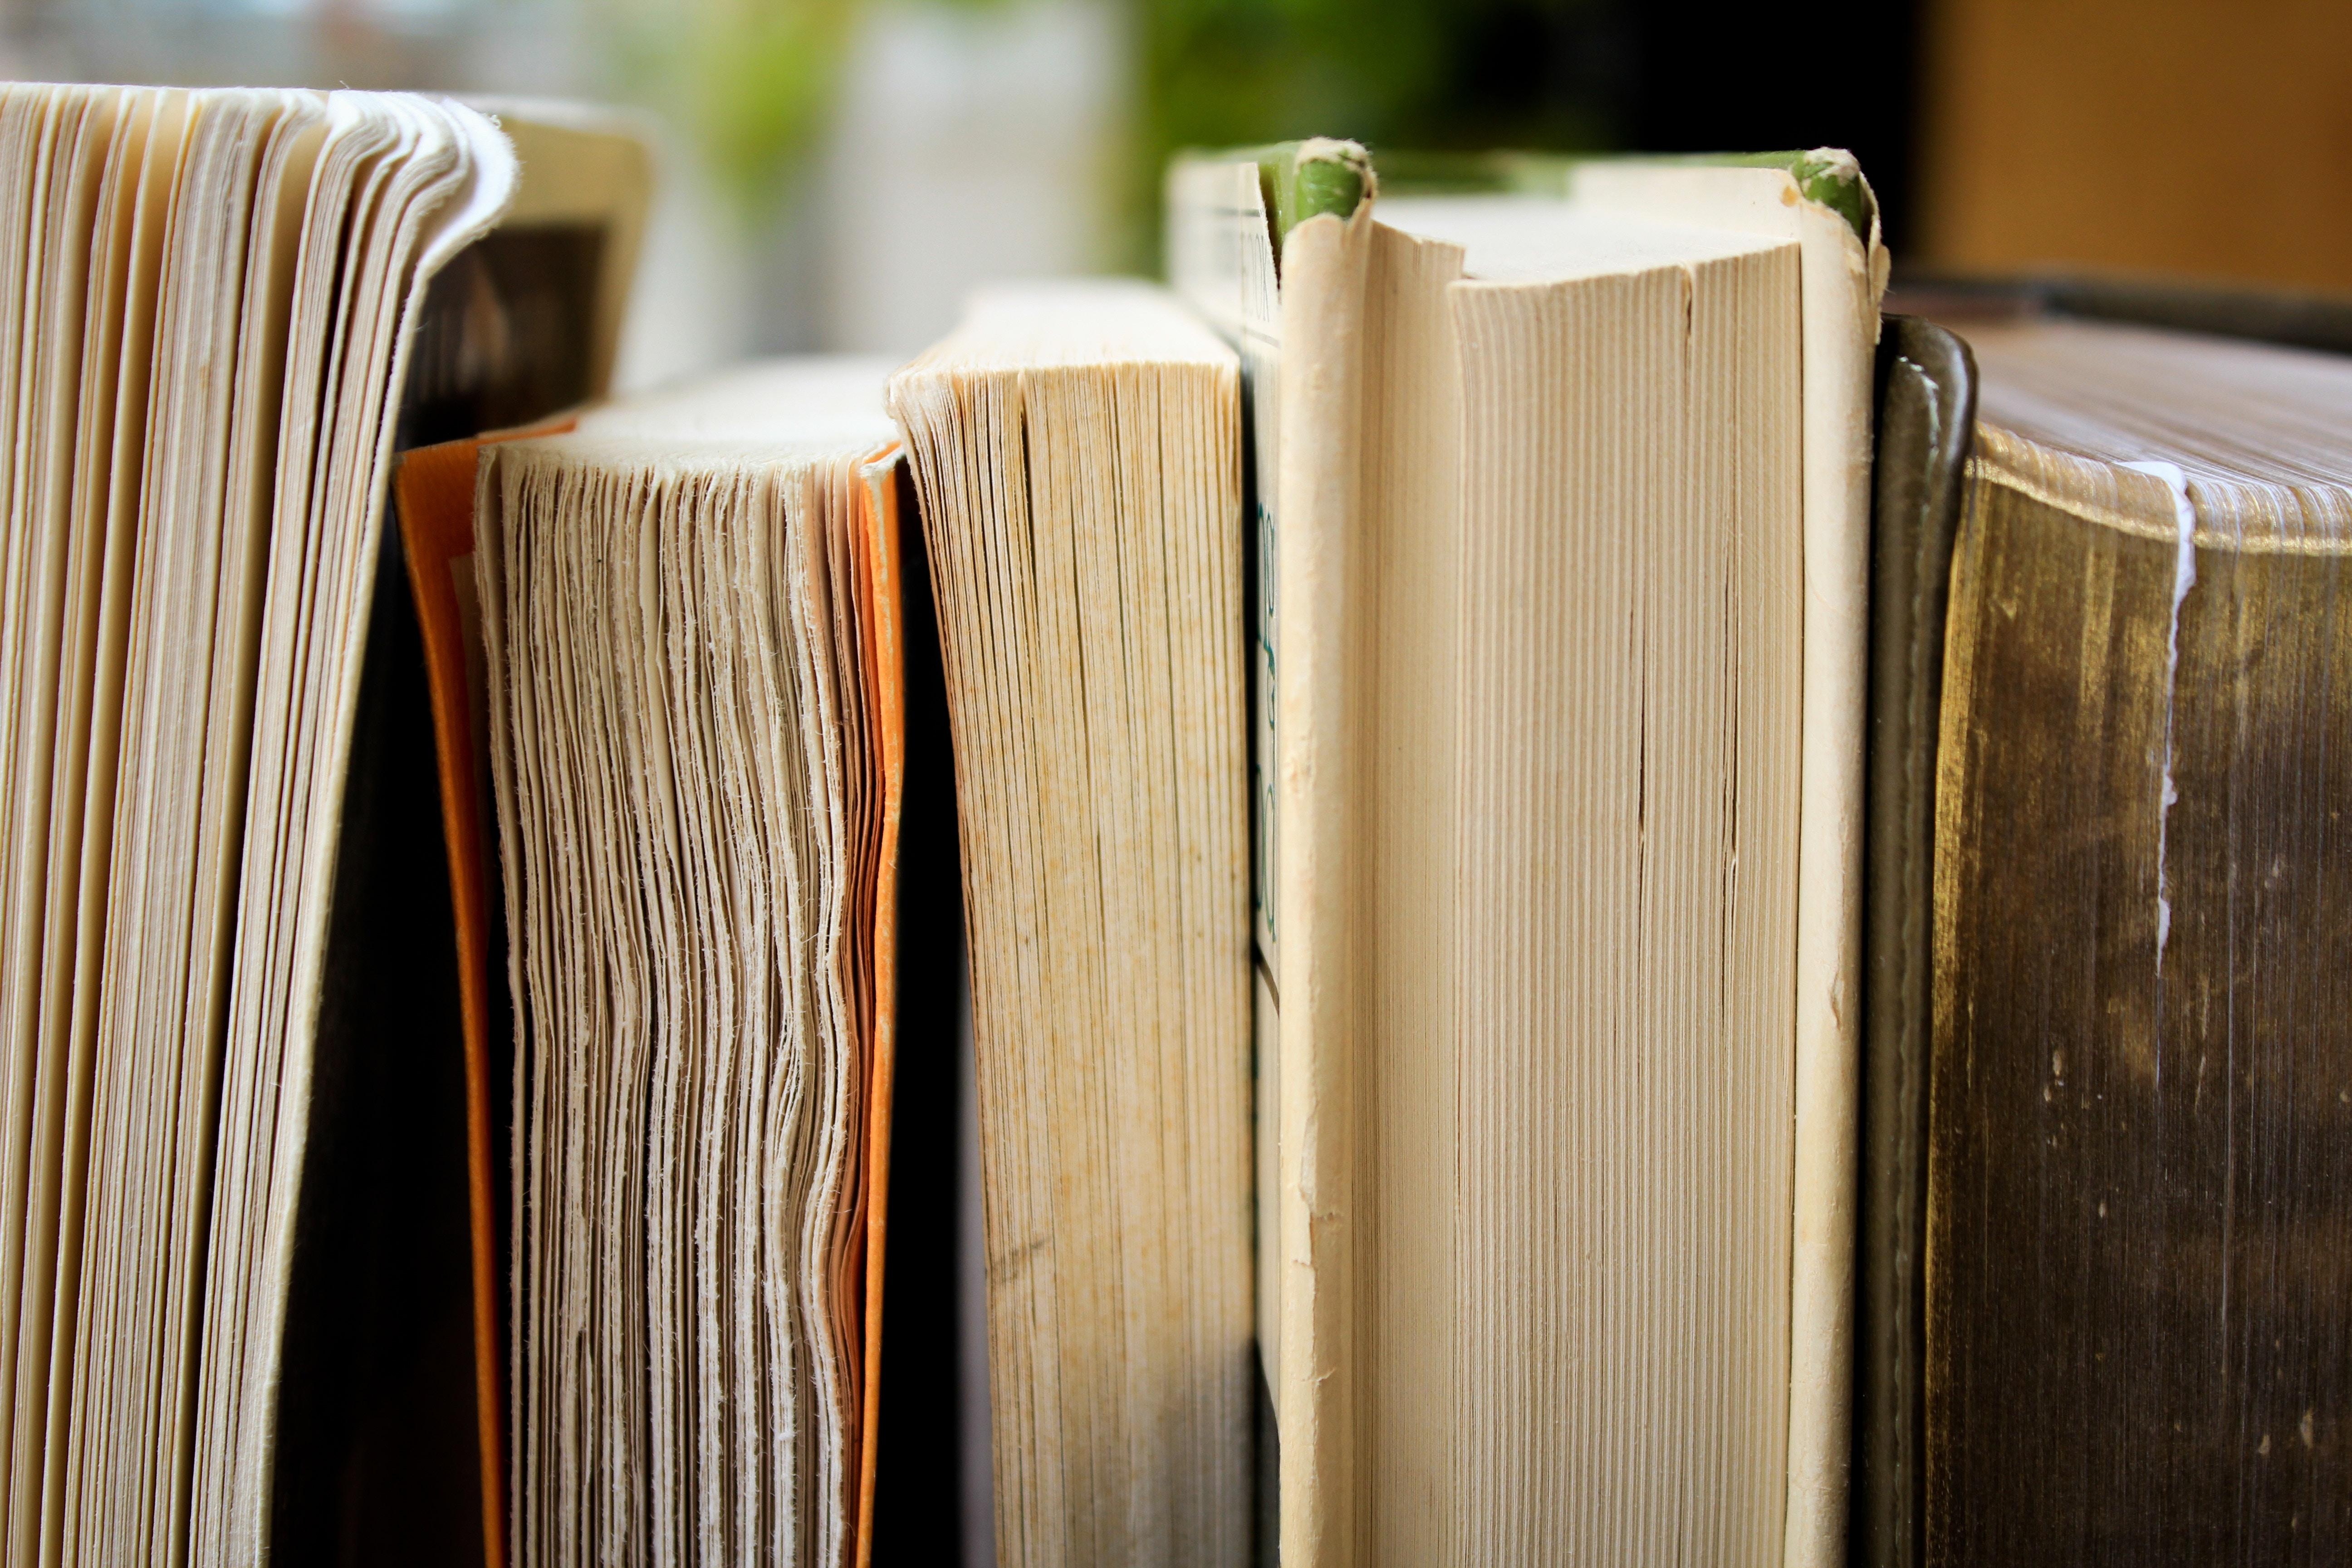 My Top 10 Favorite Books